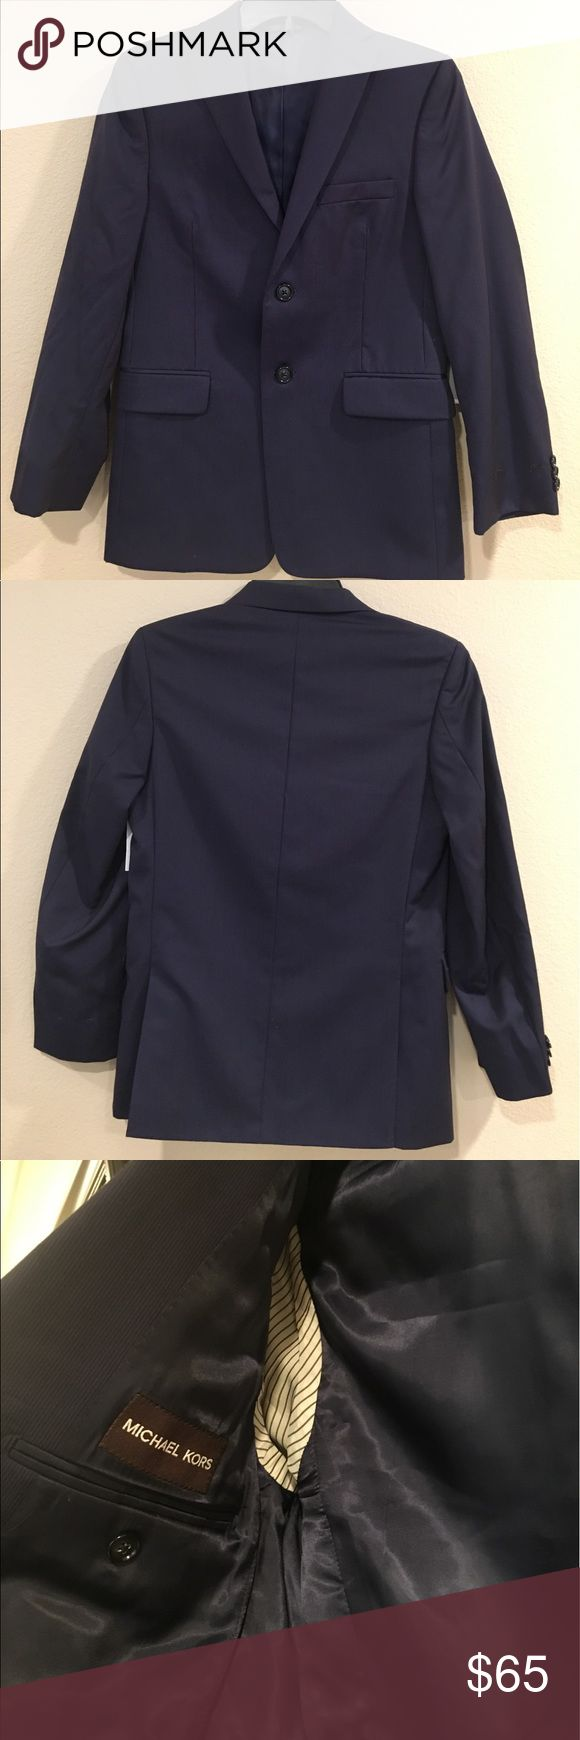 Michael Kors Navy Blazer!! Classic color Michael Kors Blazer!' 100% Wool. Michael Kors Jackets & Coats Blazers